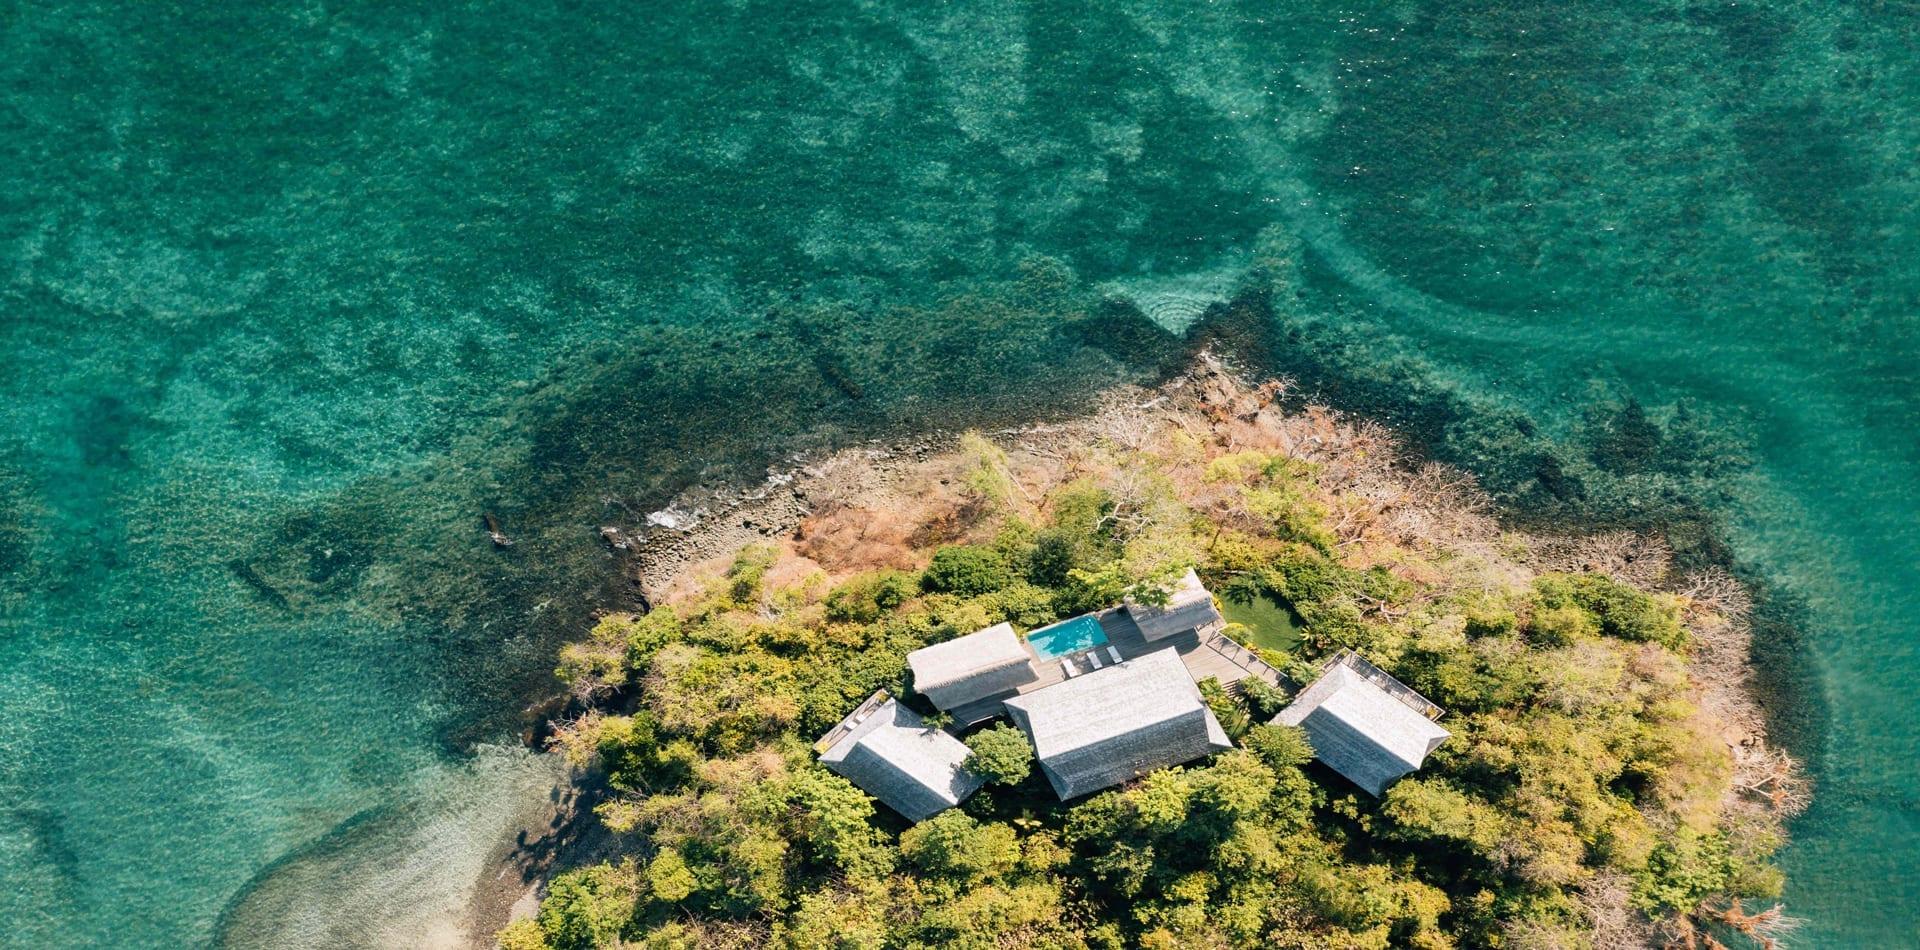 HERO Panama Isla Secas Aerial View